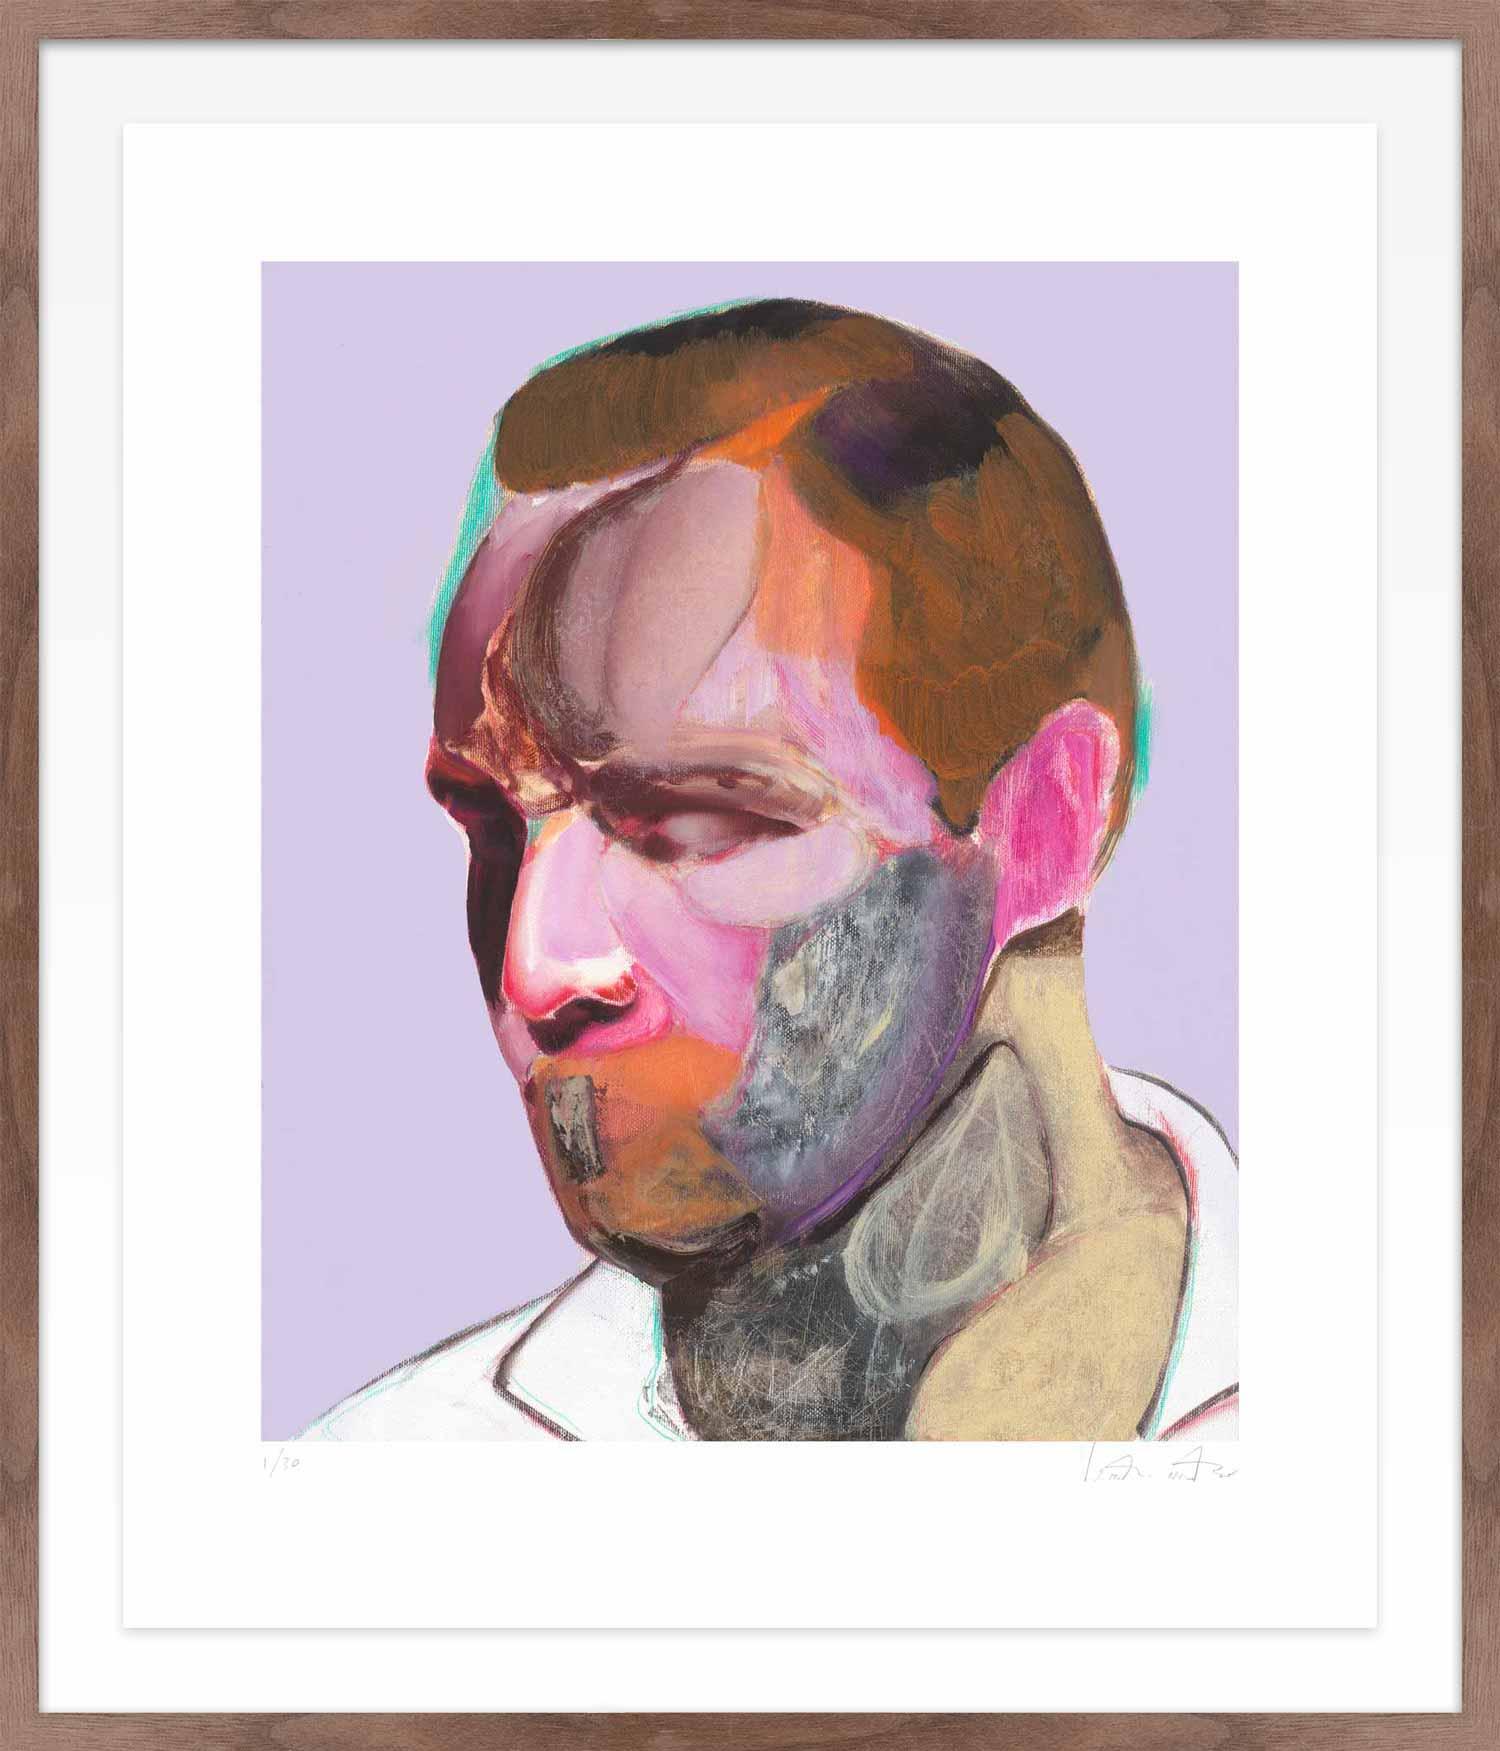 Hang Tough 'Untitled' Float Framed in Walnut (Framing Only)